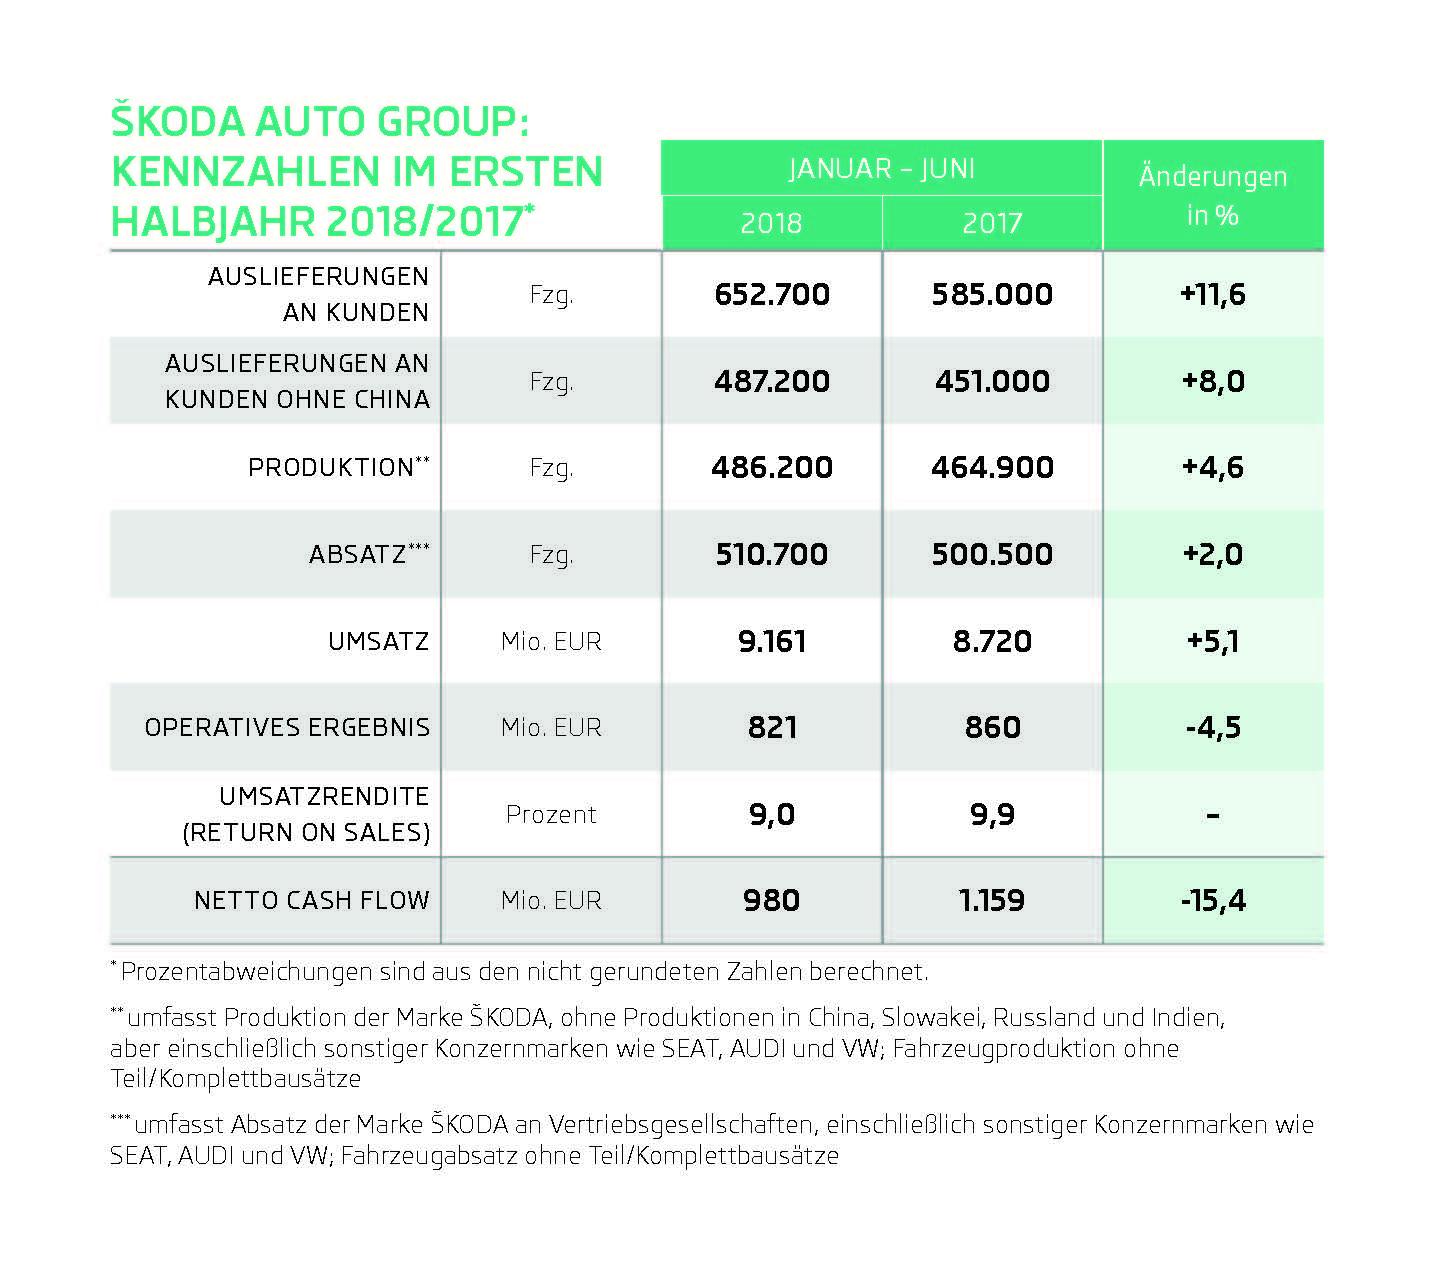 180802-INFOGRAFIK-SKODA-AUTO-Kennzahlen-1H-2018